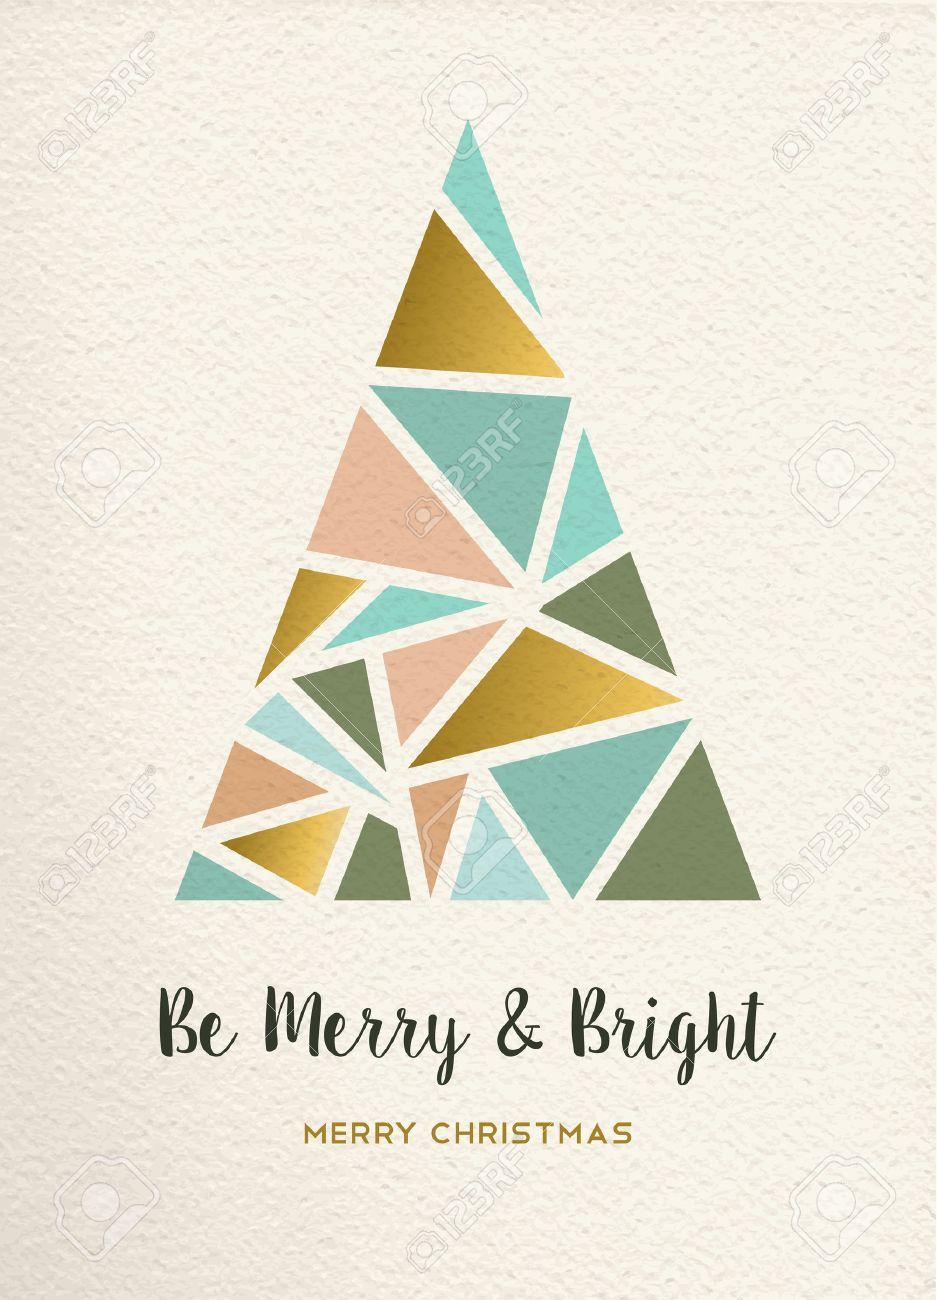 merry christmas triangle pine tree design in retro geometry style